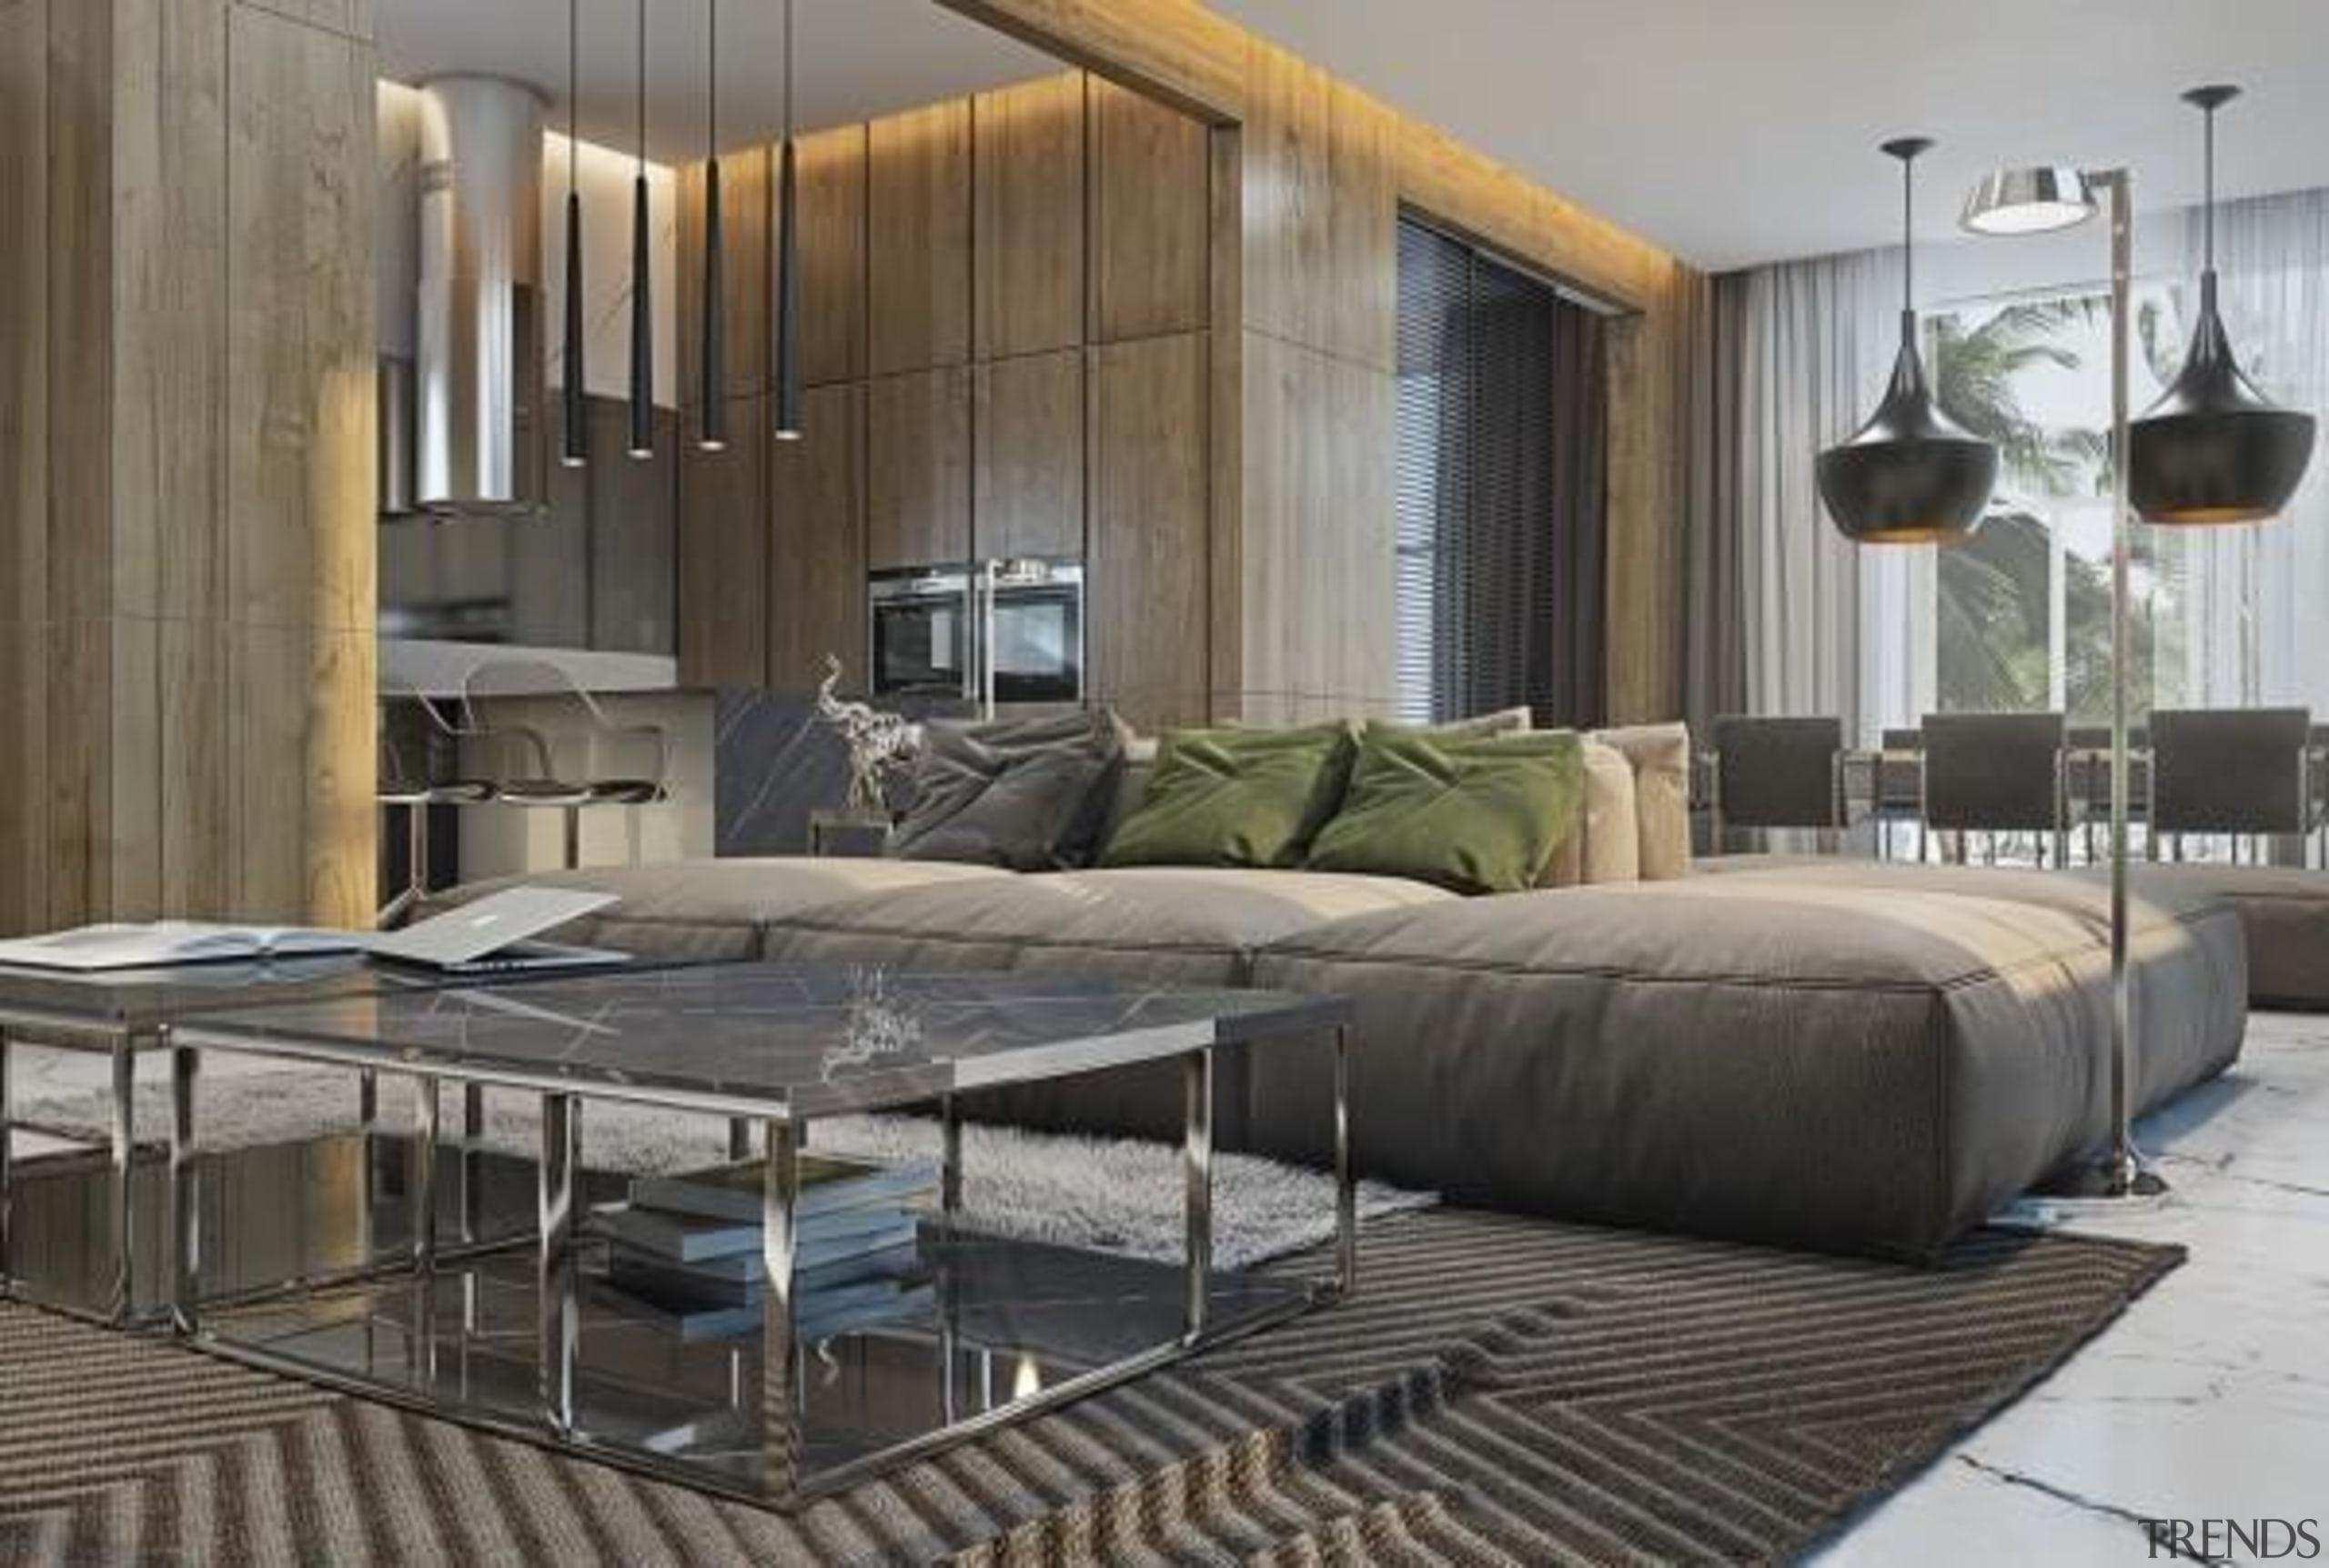 modern style apartment interior - Masculine Apartments - furniture, interior design, living room, gray, black